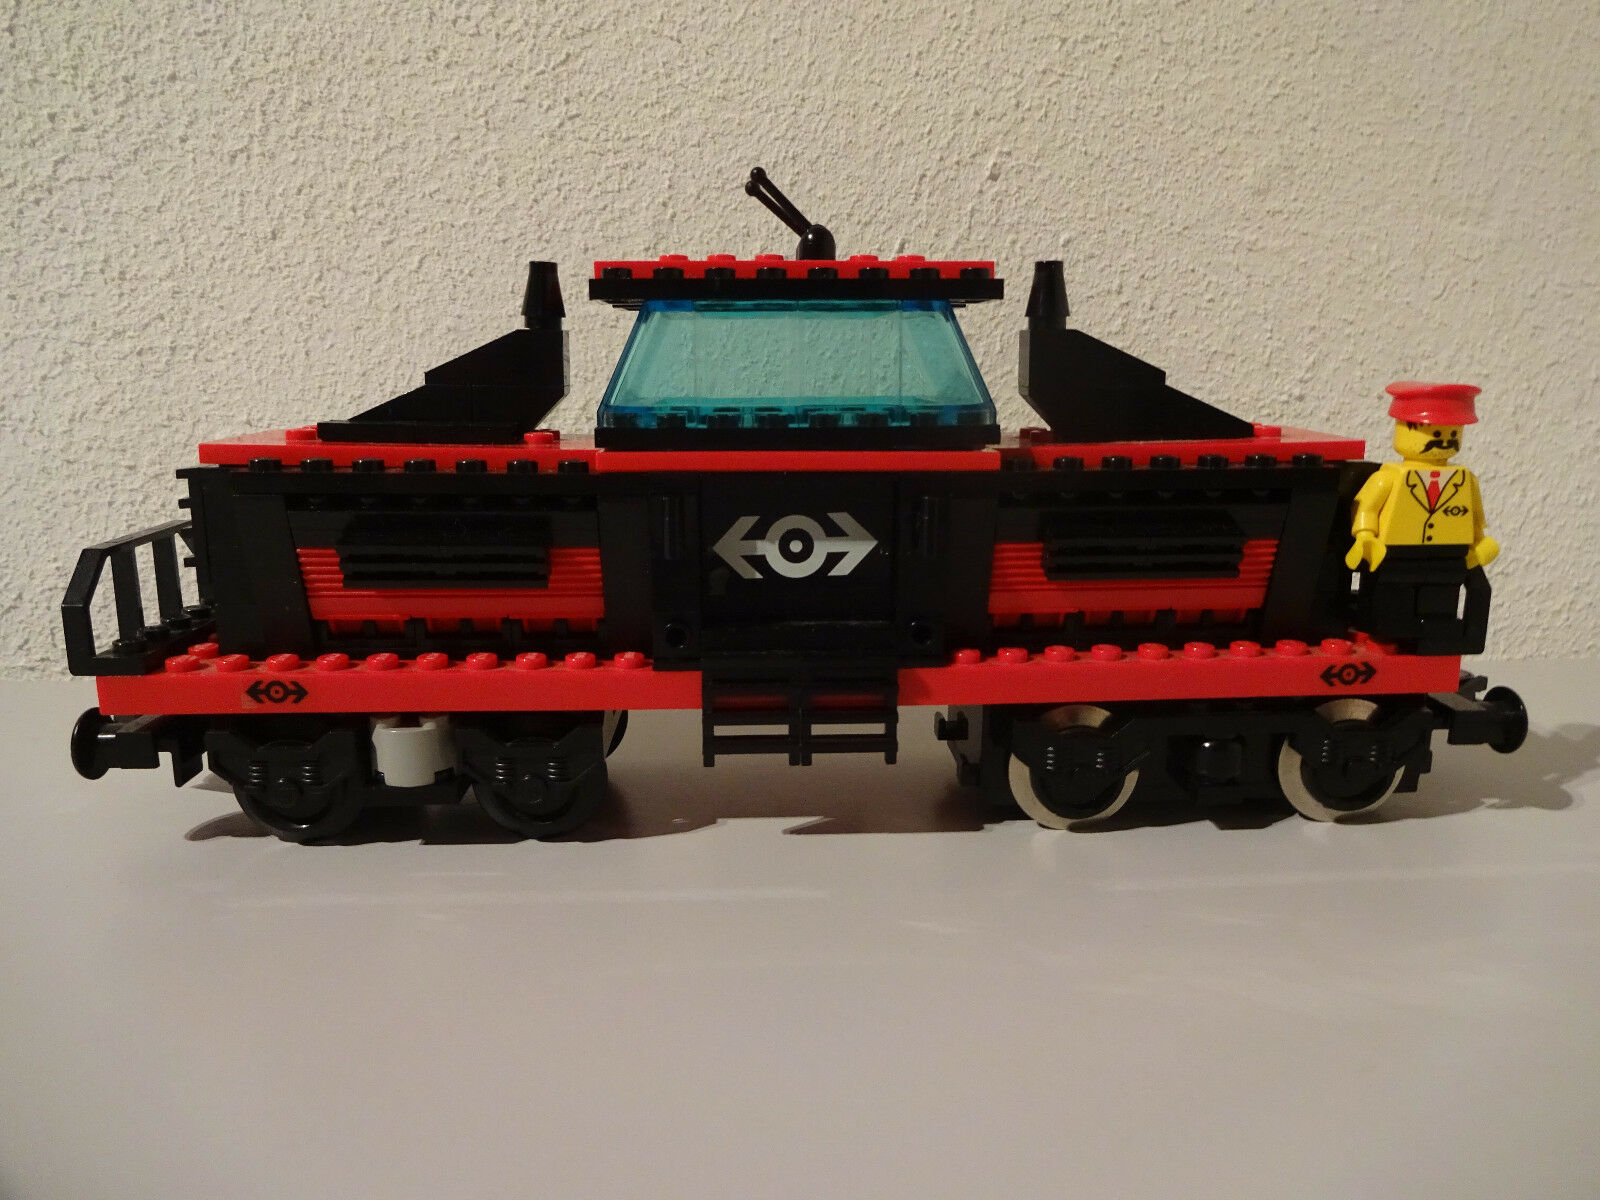 (g9) Lego System 4566 locomotive chemin de fer d'occasion 9 V examiné personnage